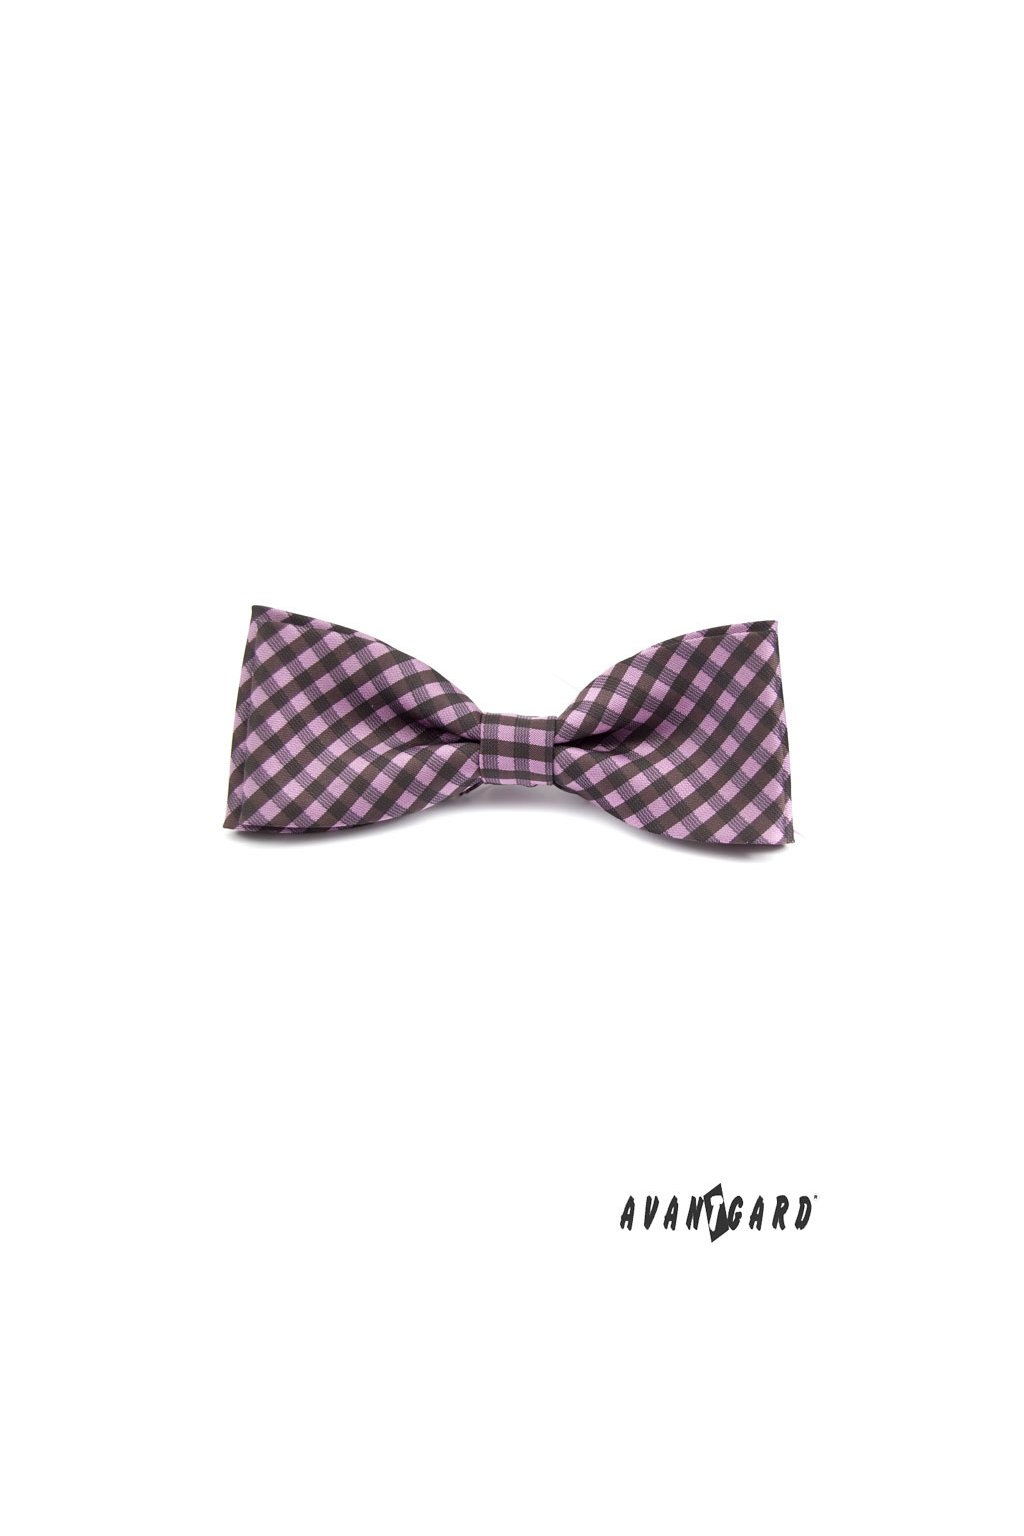 Motýlek Fialová Avantgard 100% polyester šířka 10 cm Károvaný